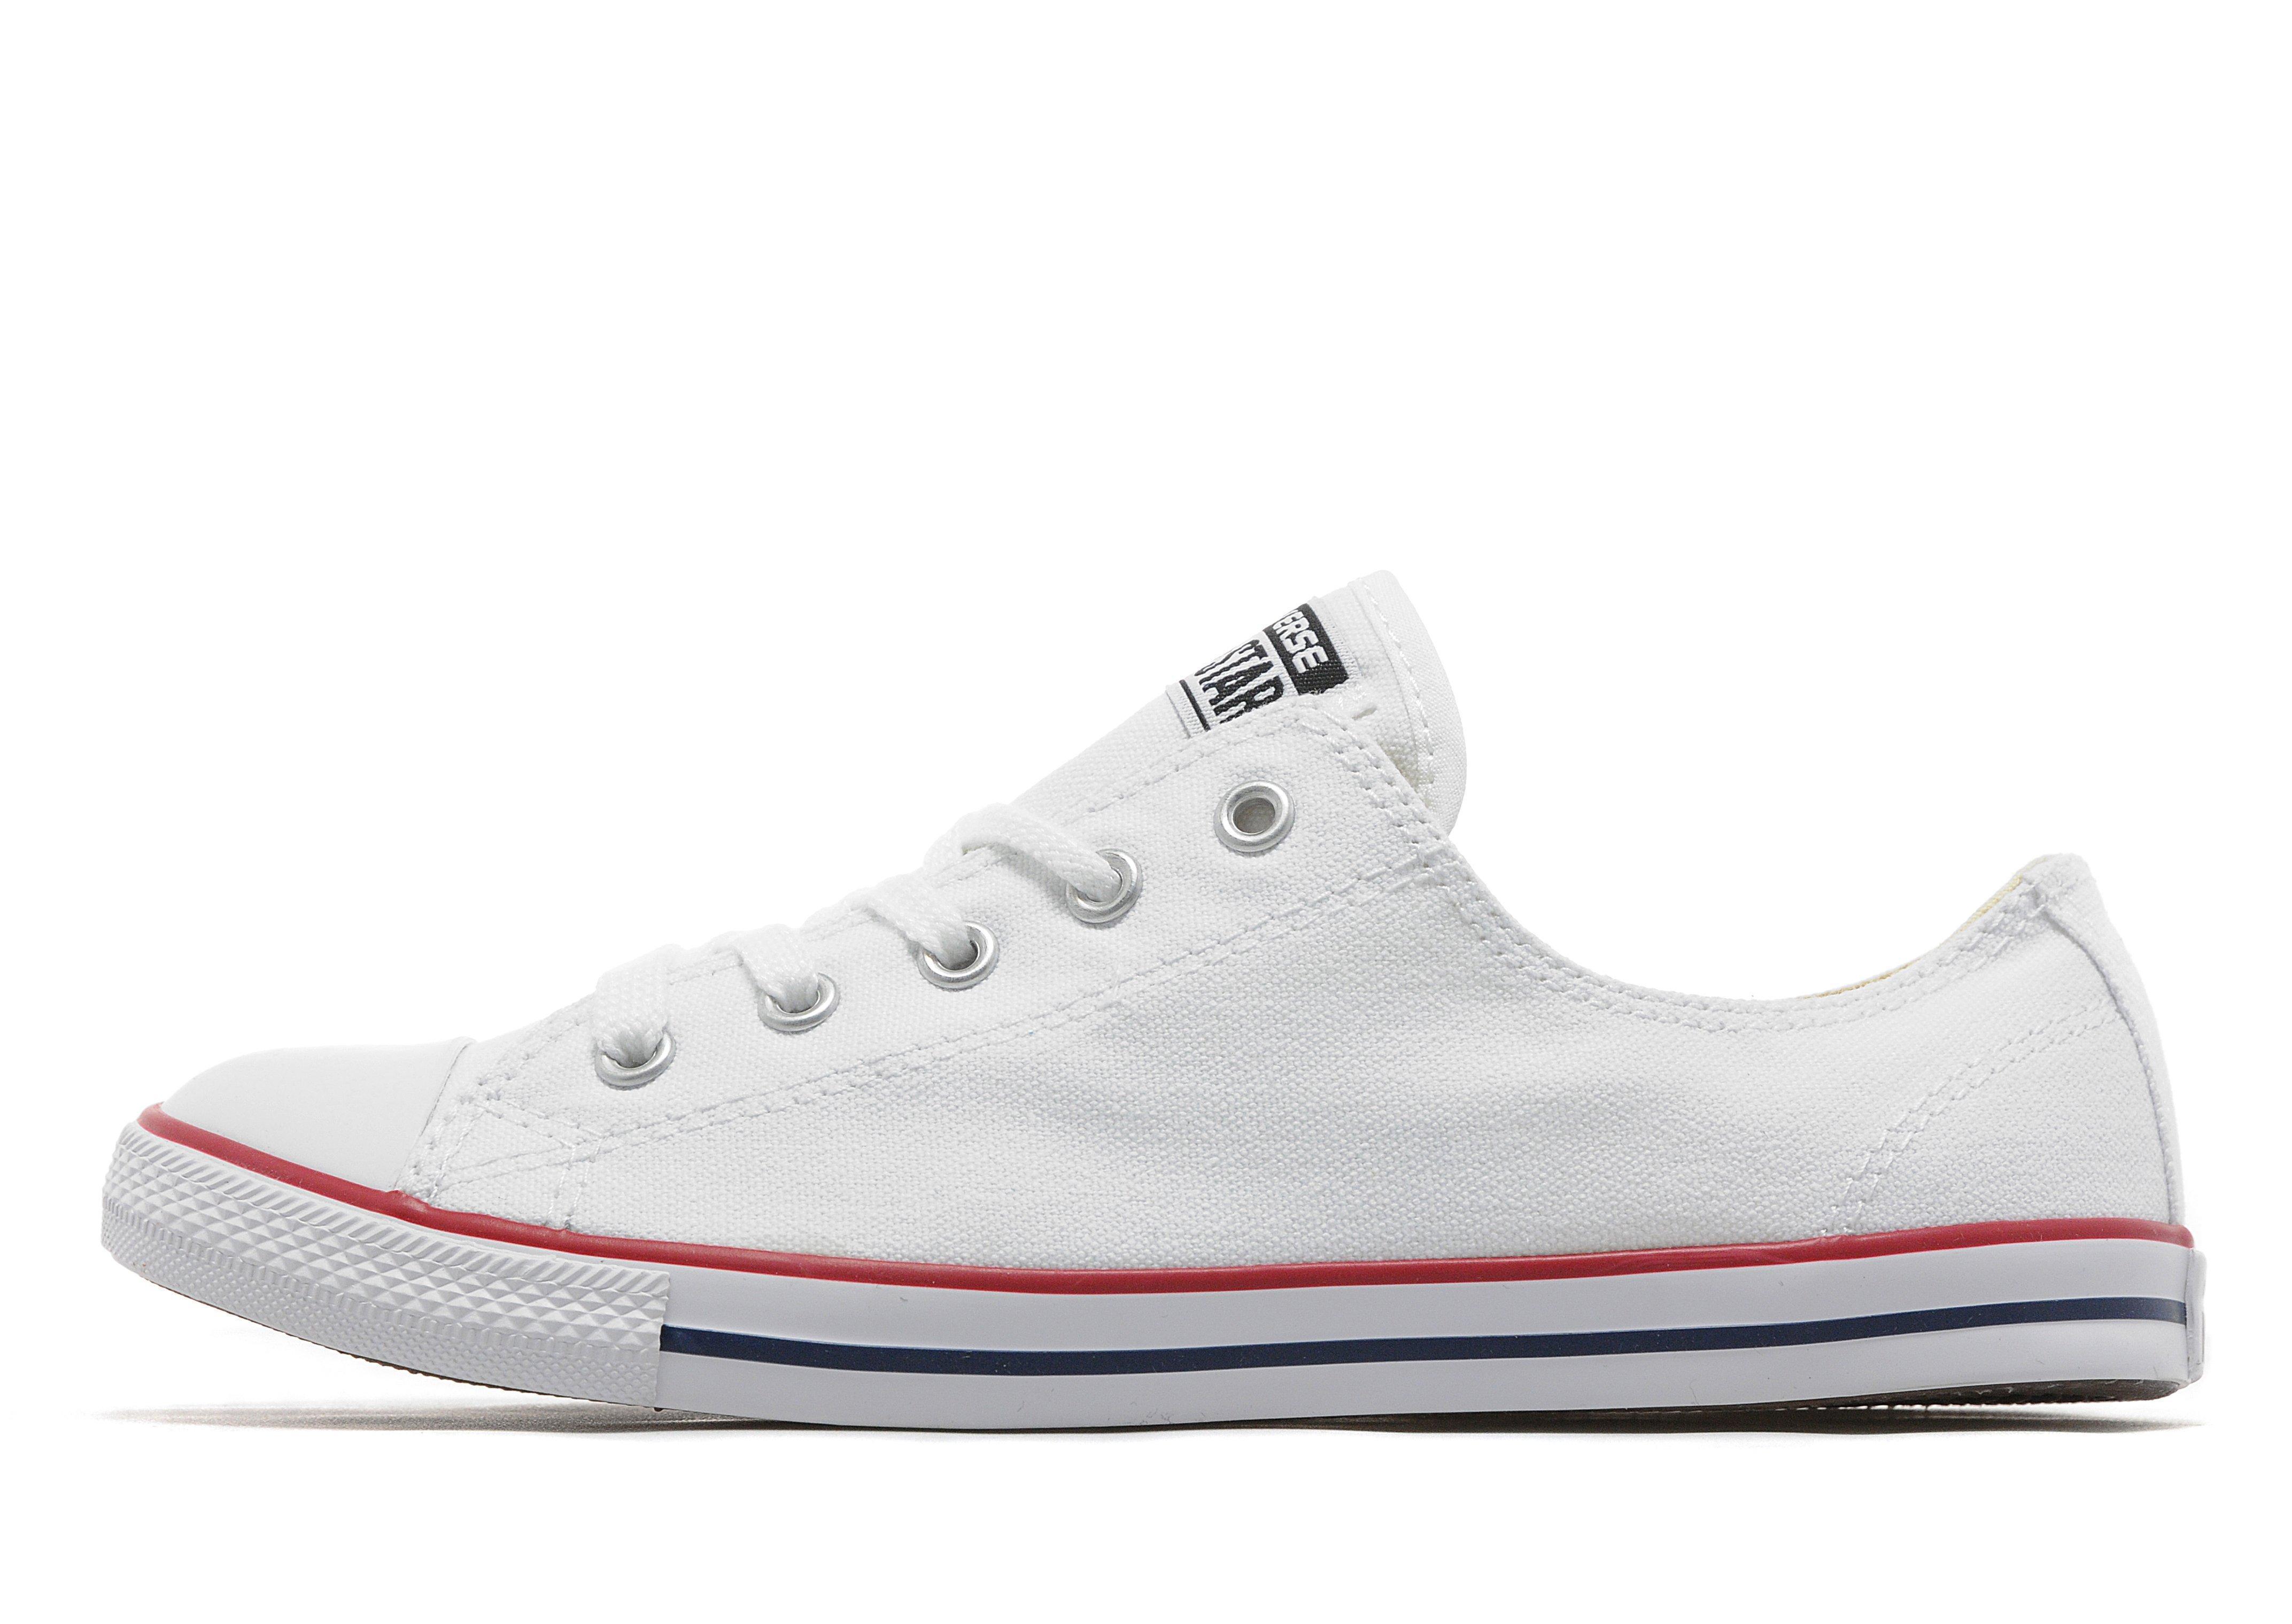 029dd04d313e Converse Dainty Ox in White for Men - Lyst